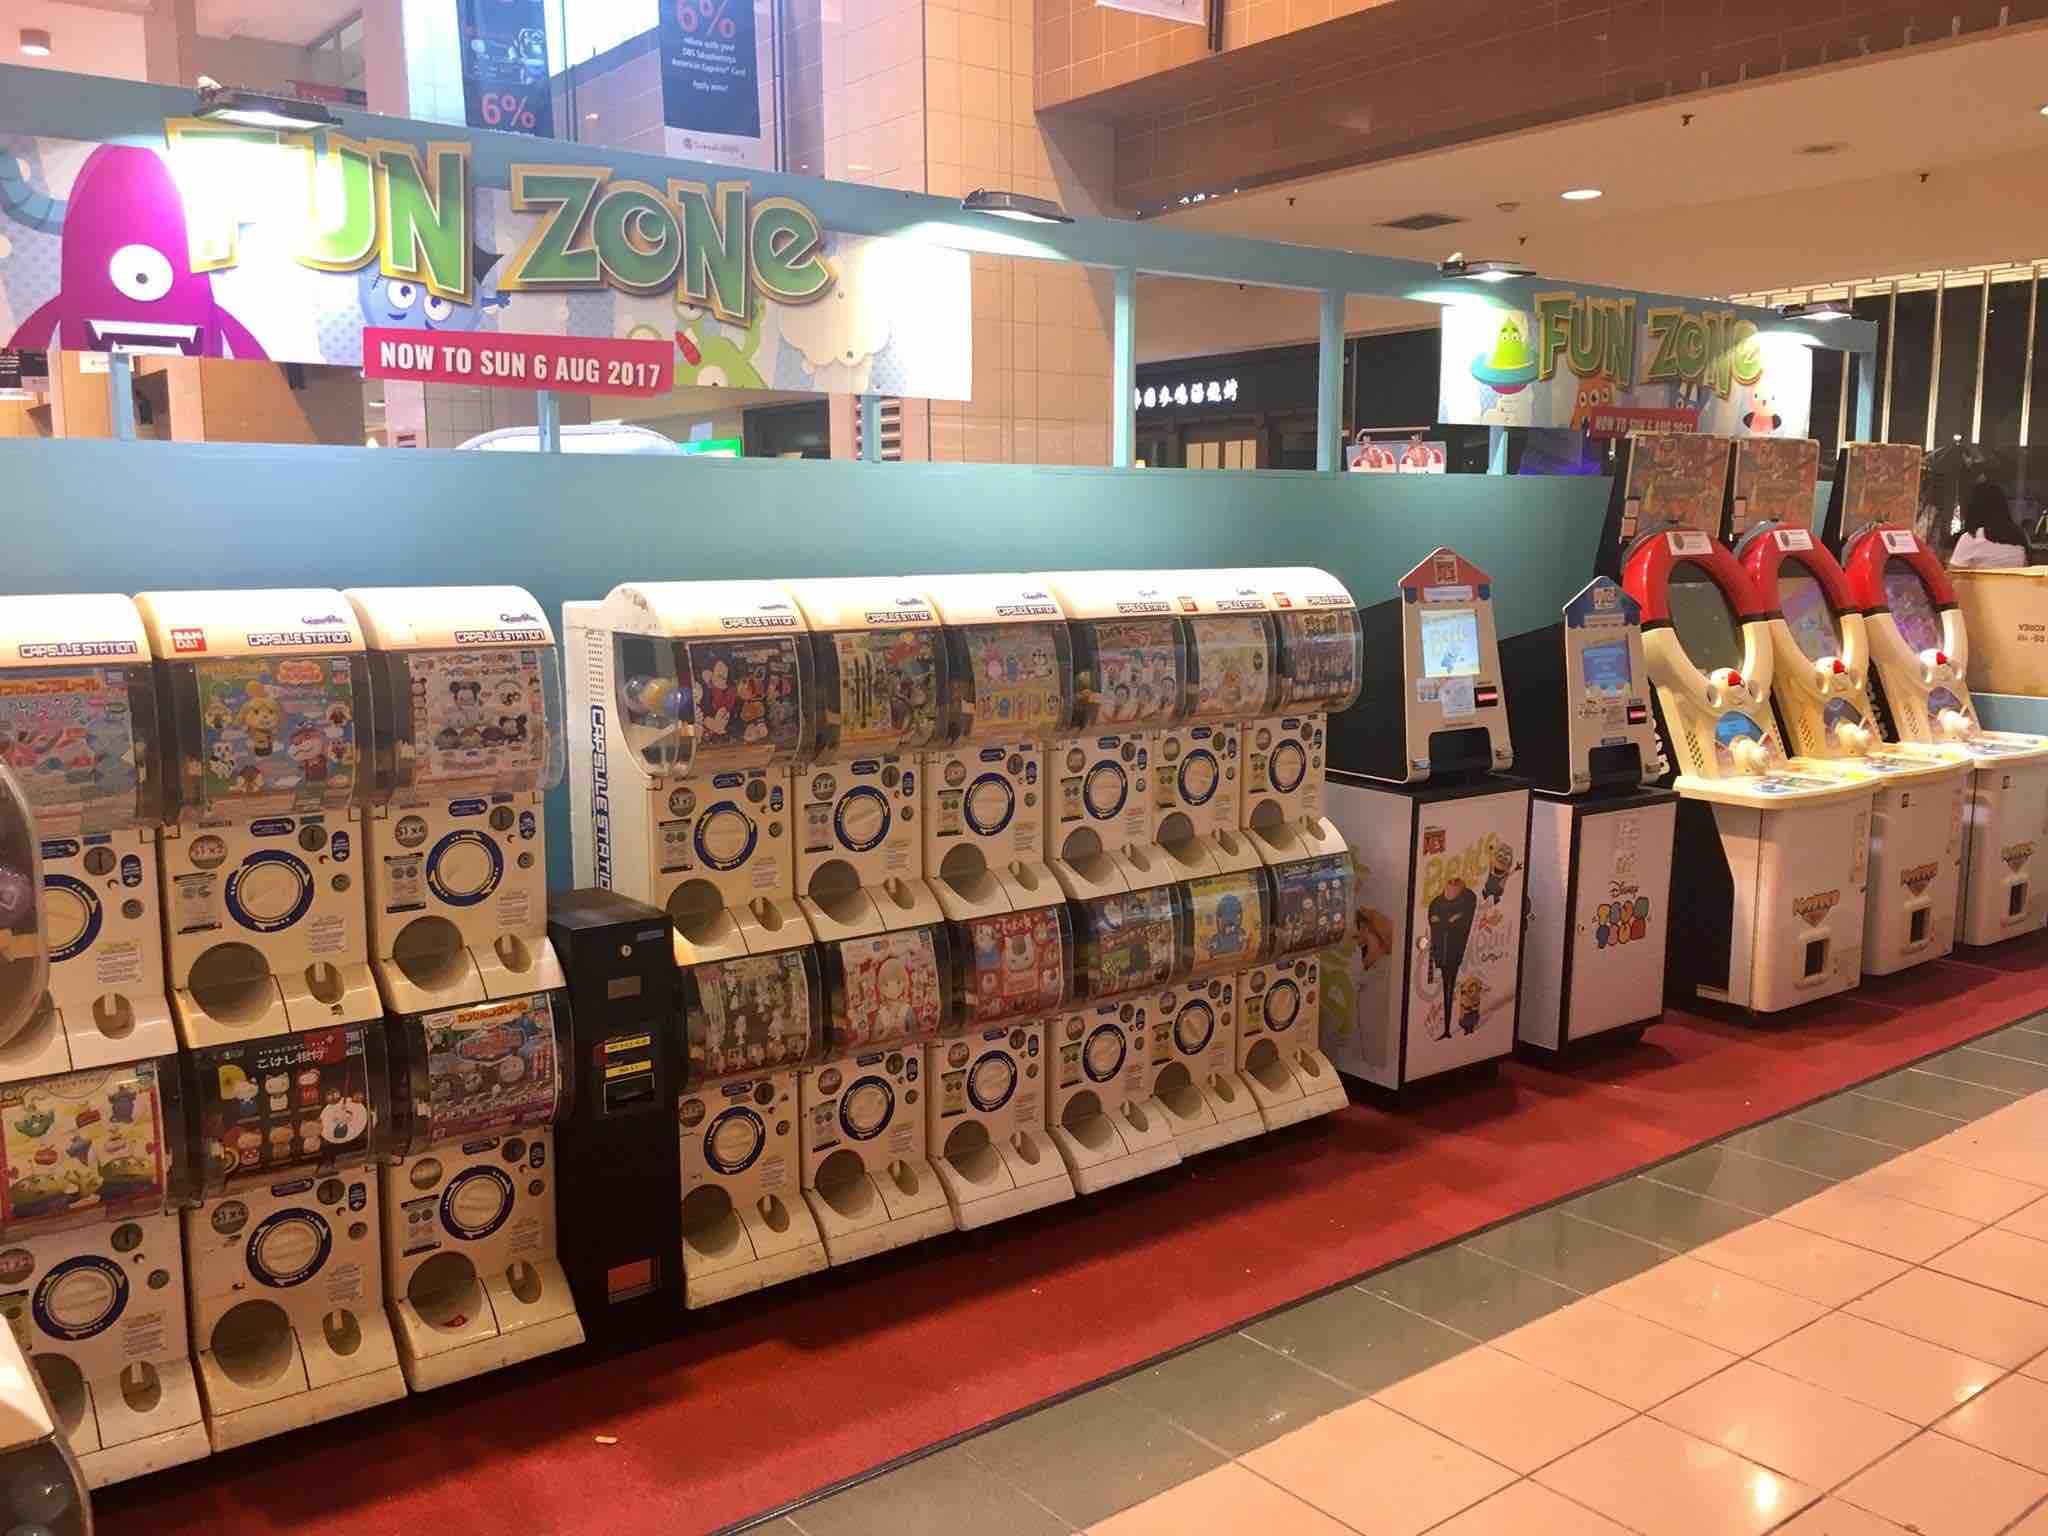 Takashimaya Singapore 21st Craziest Toys Sale Promotion 28 Jul - 6 Aug 2017   Why Not Deals 6 & Promotions